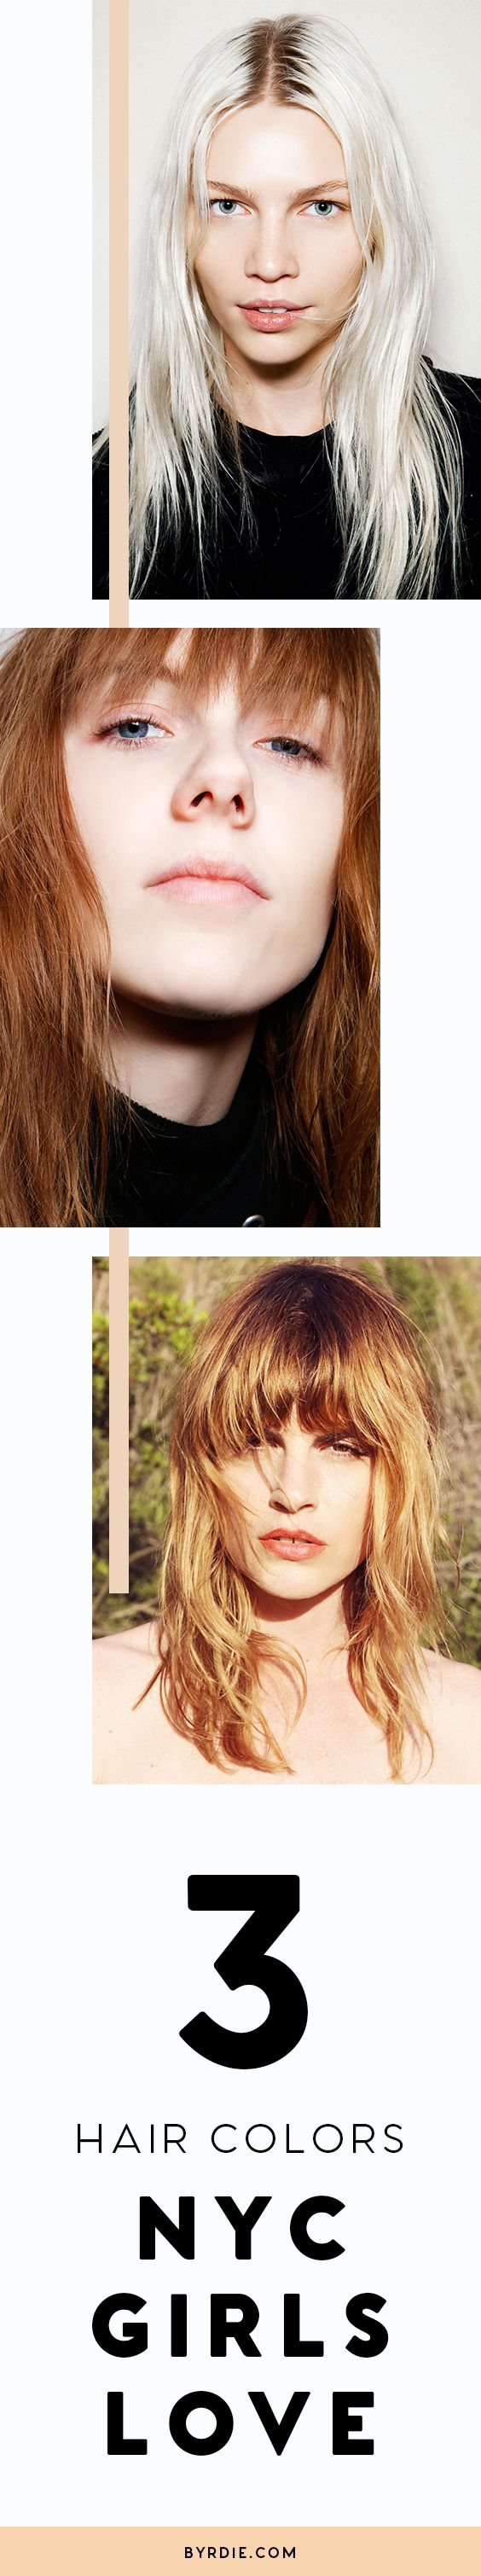 3 trending hair colors that NYC girls love